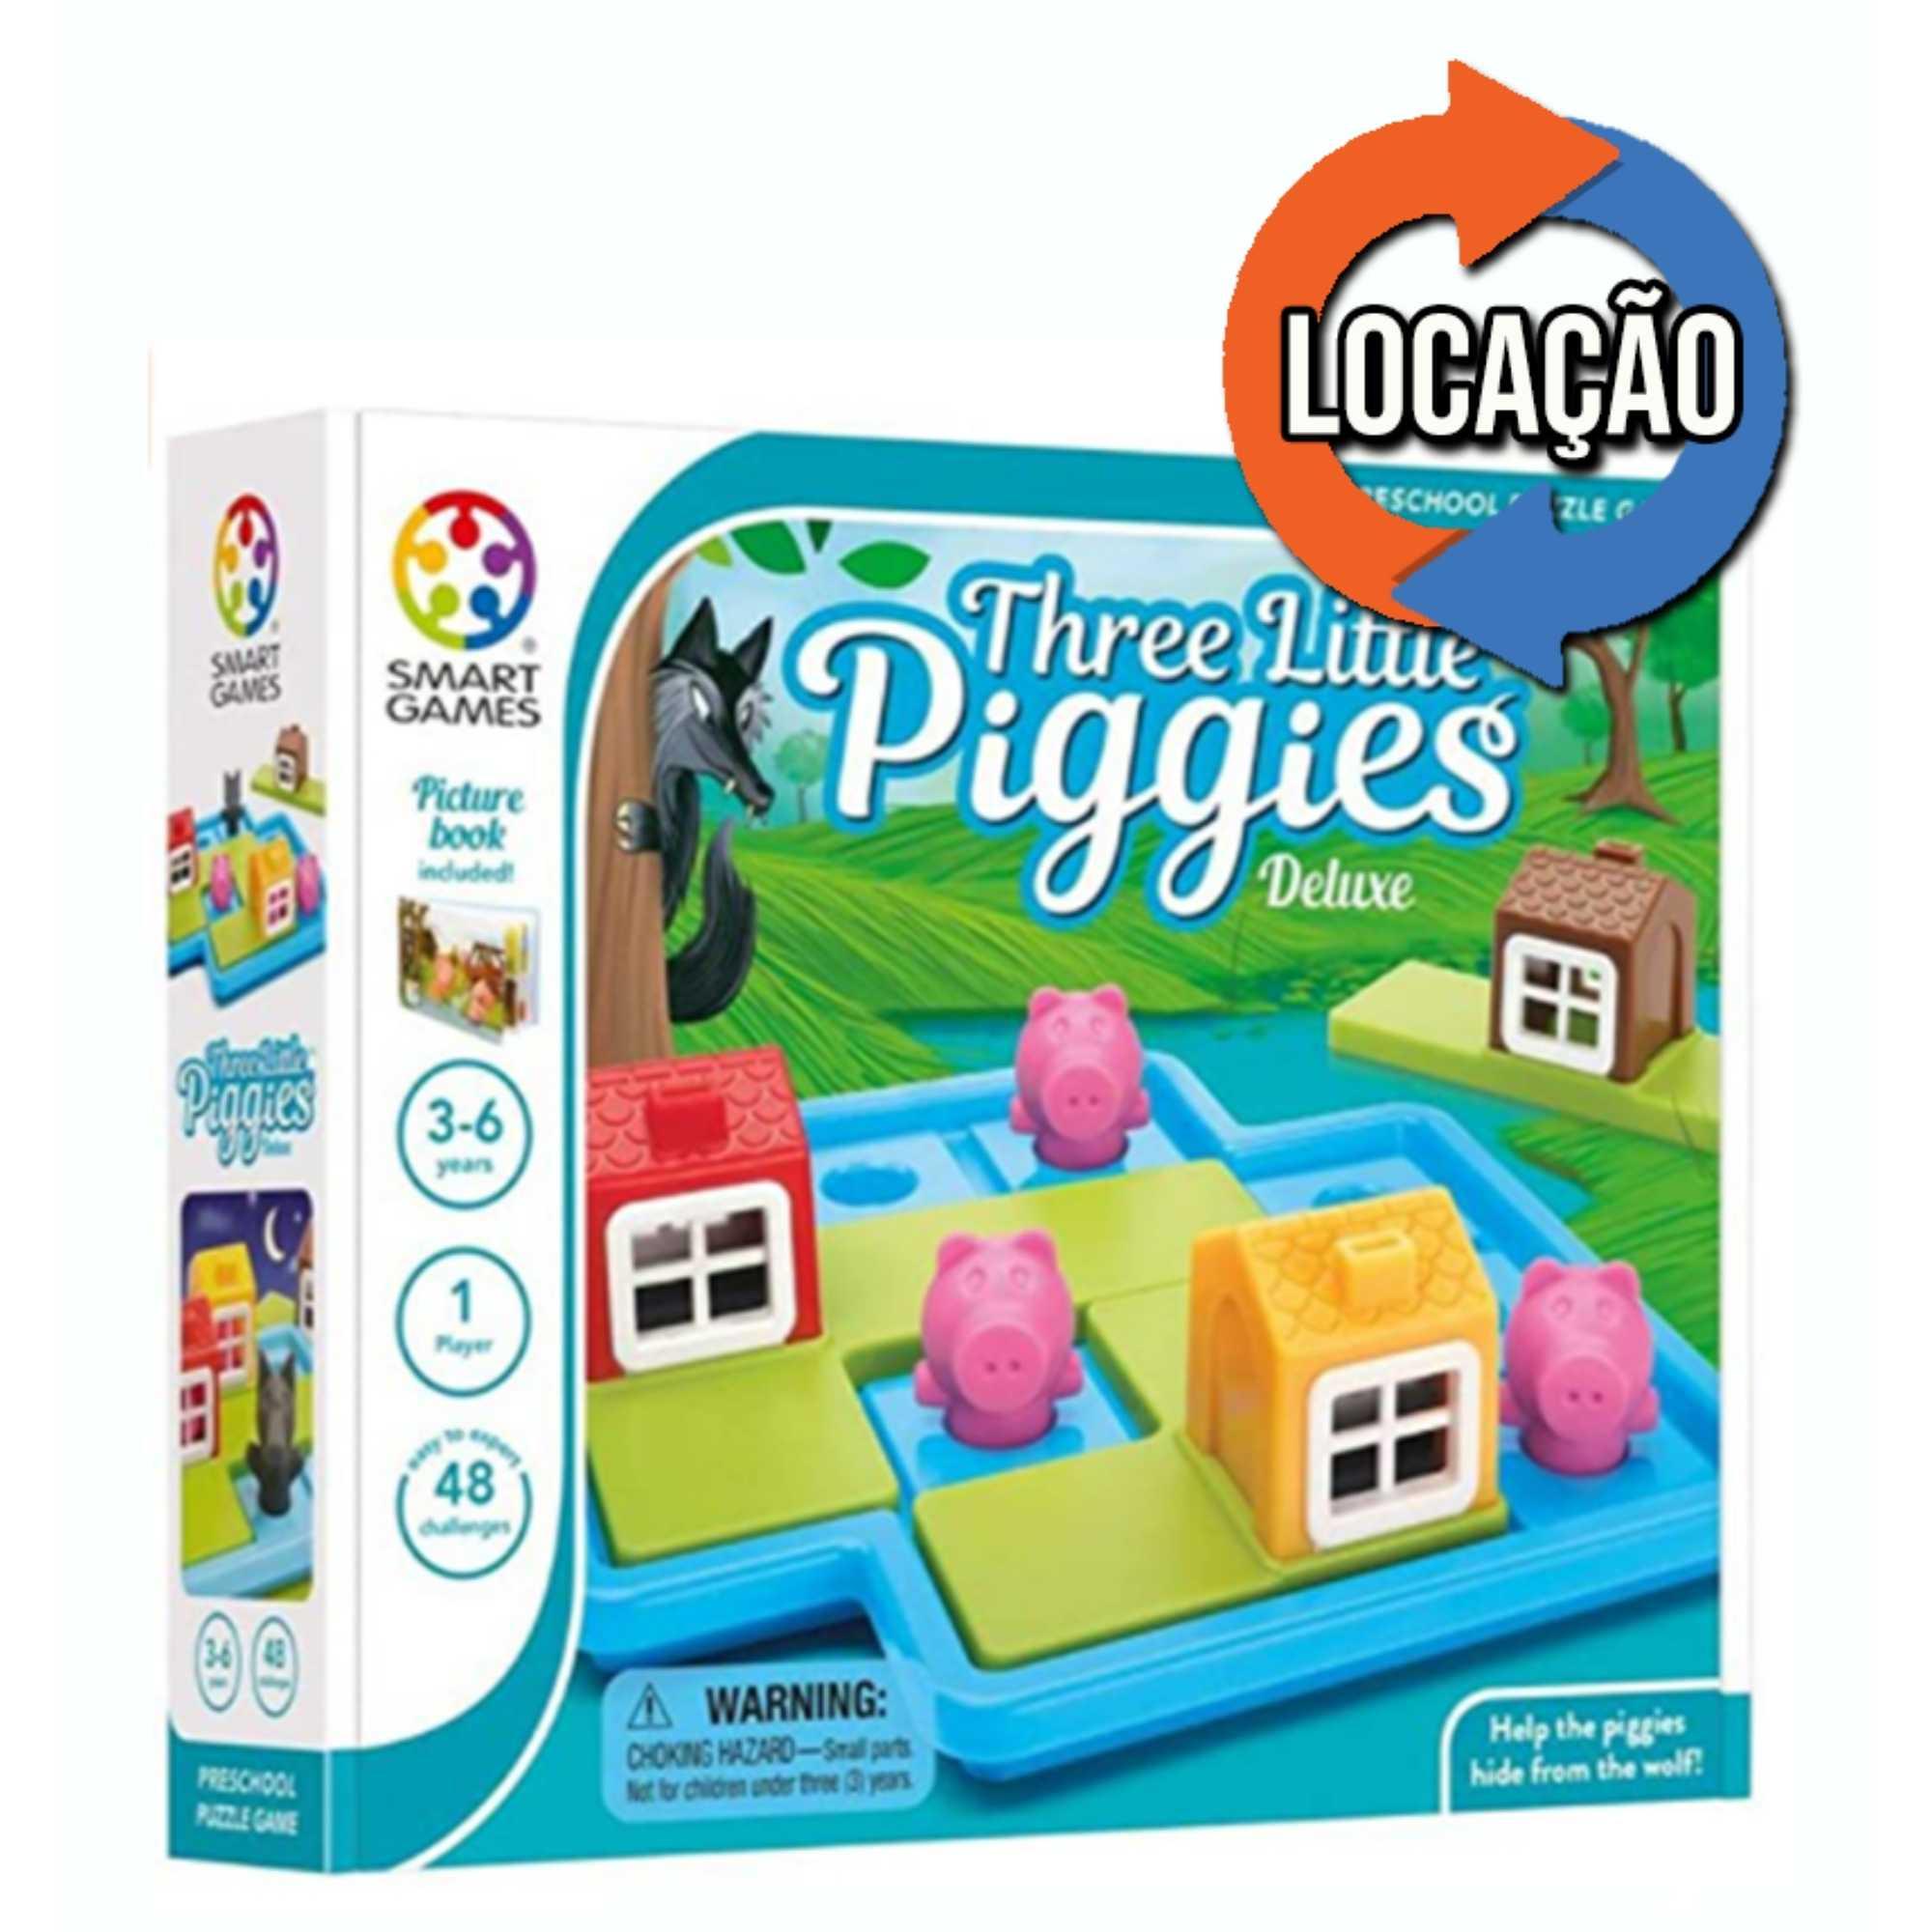 Three Little Piggies Deluxe - Smartgames (Locação)